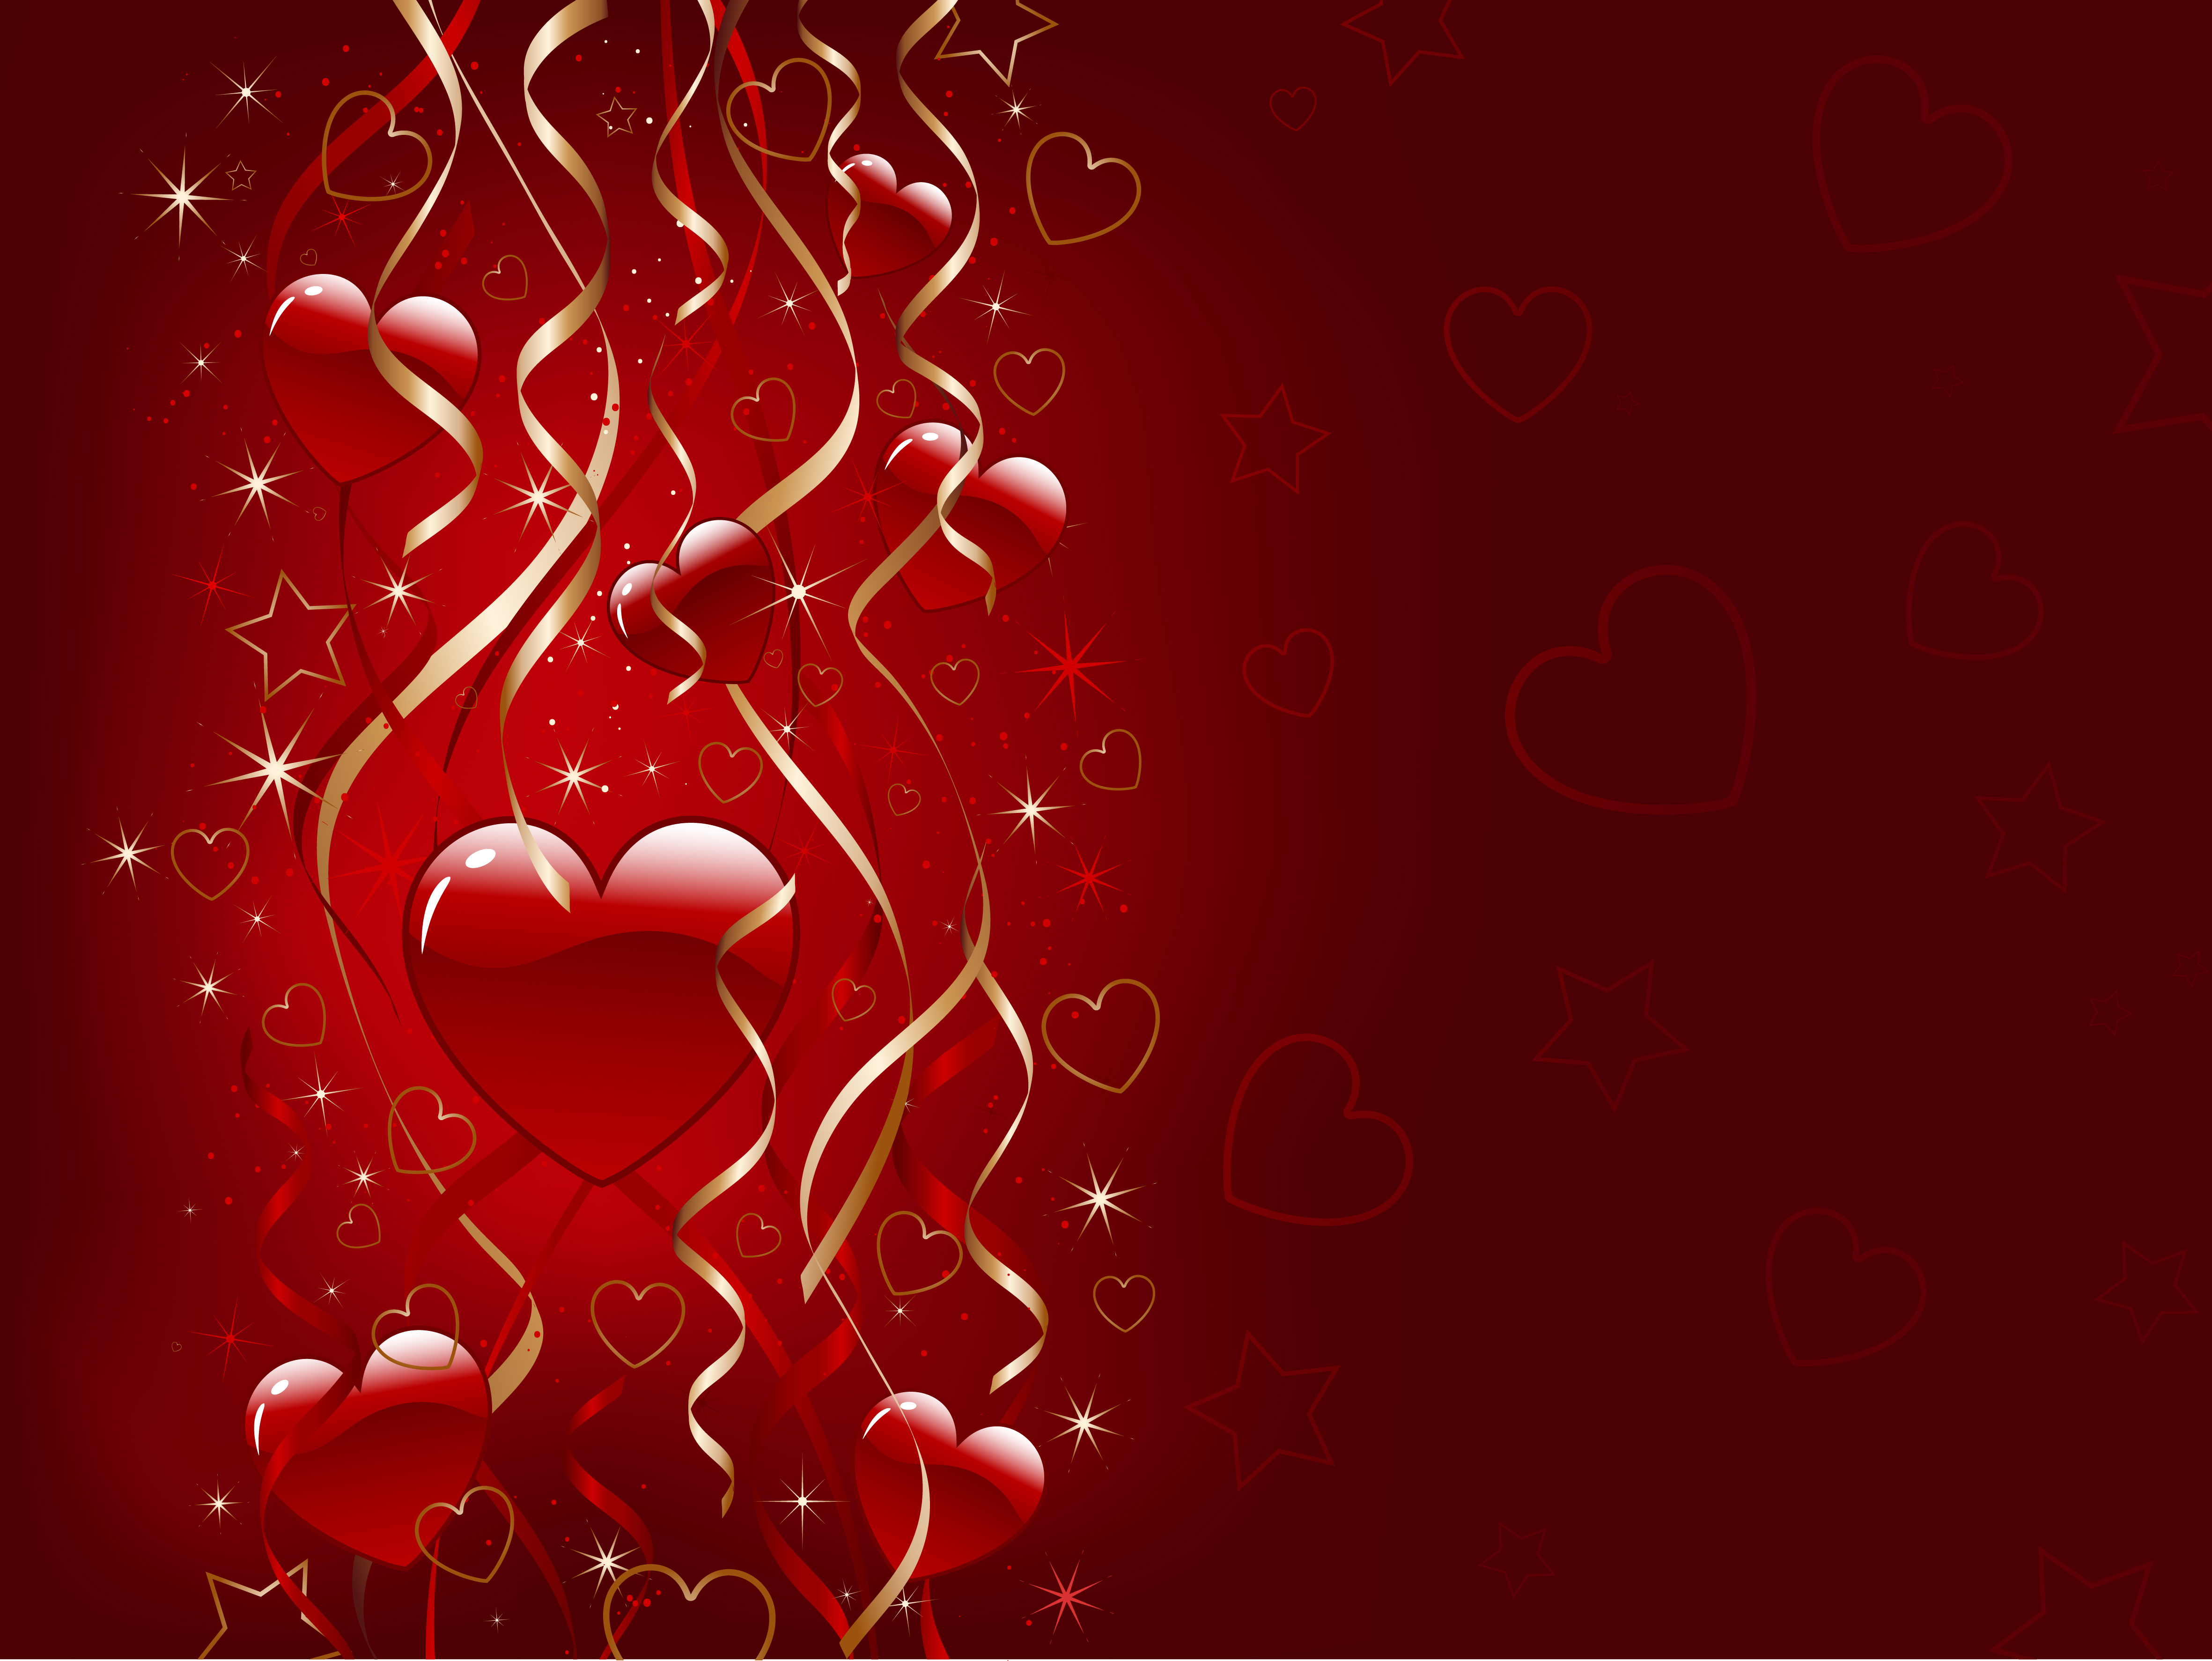 valentines day background download free vector art. Black Bedroom Furniture Sets. Home Design Ideas